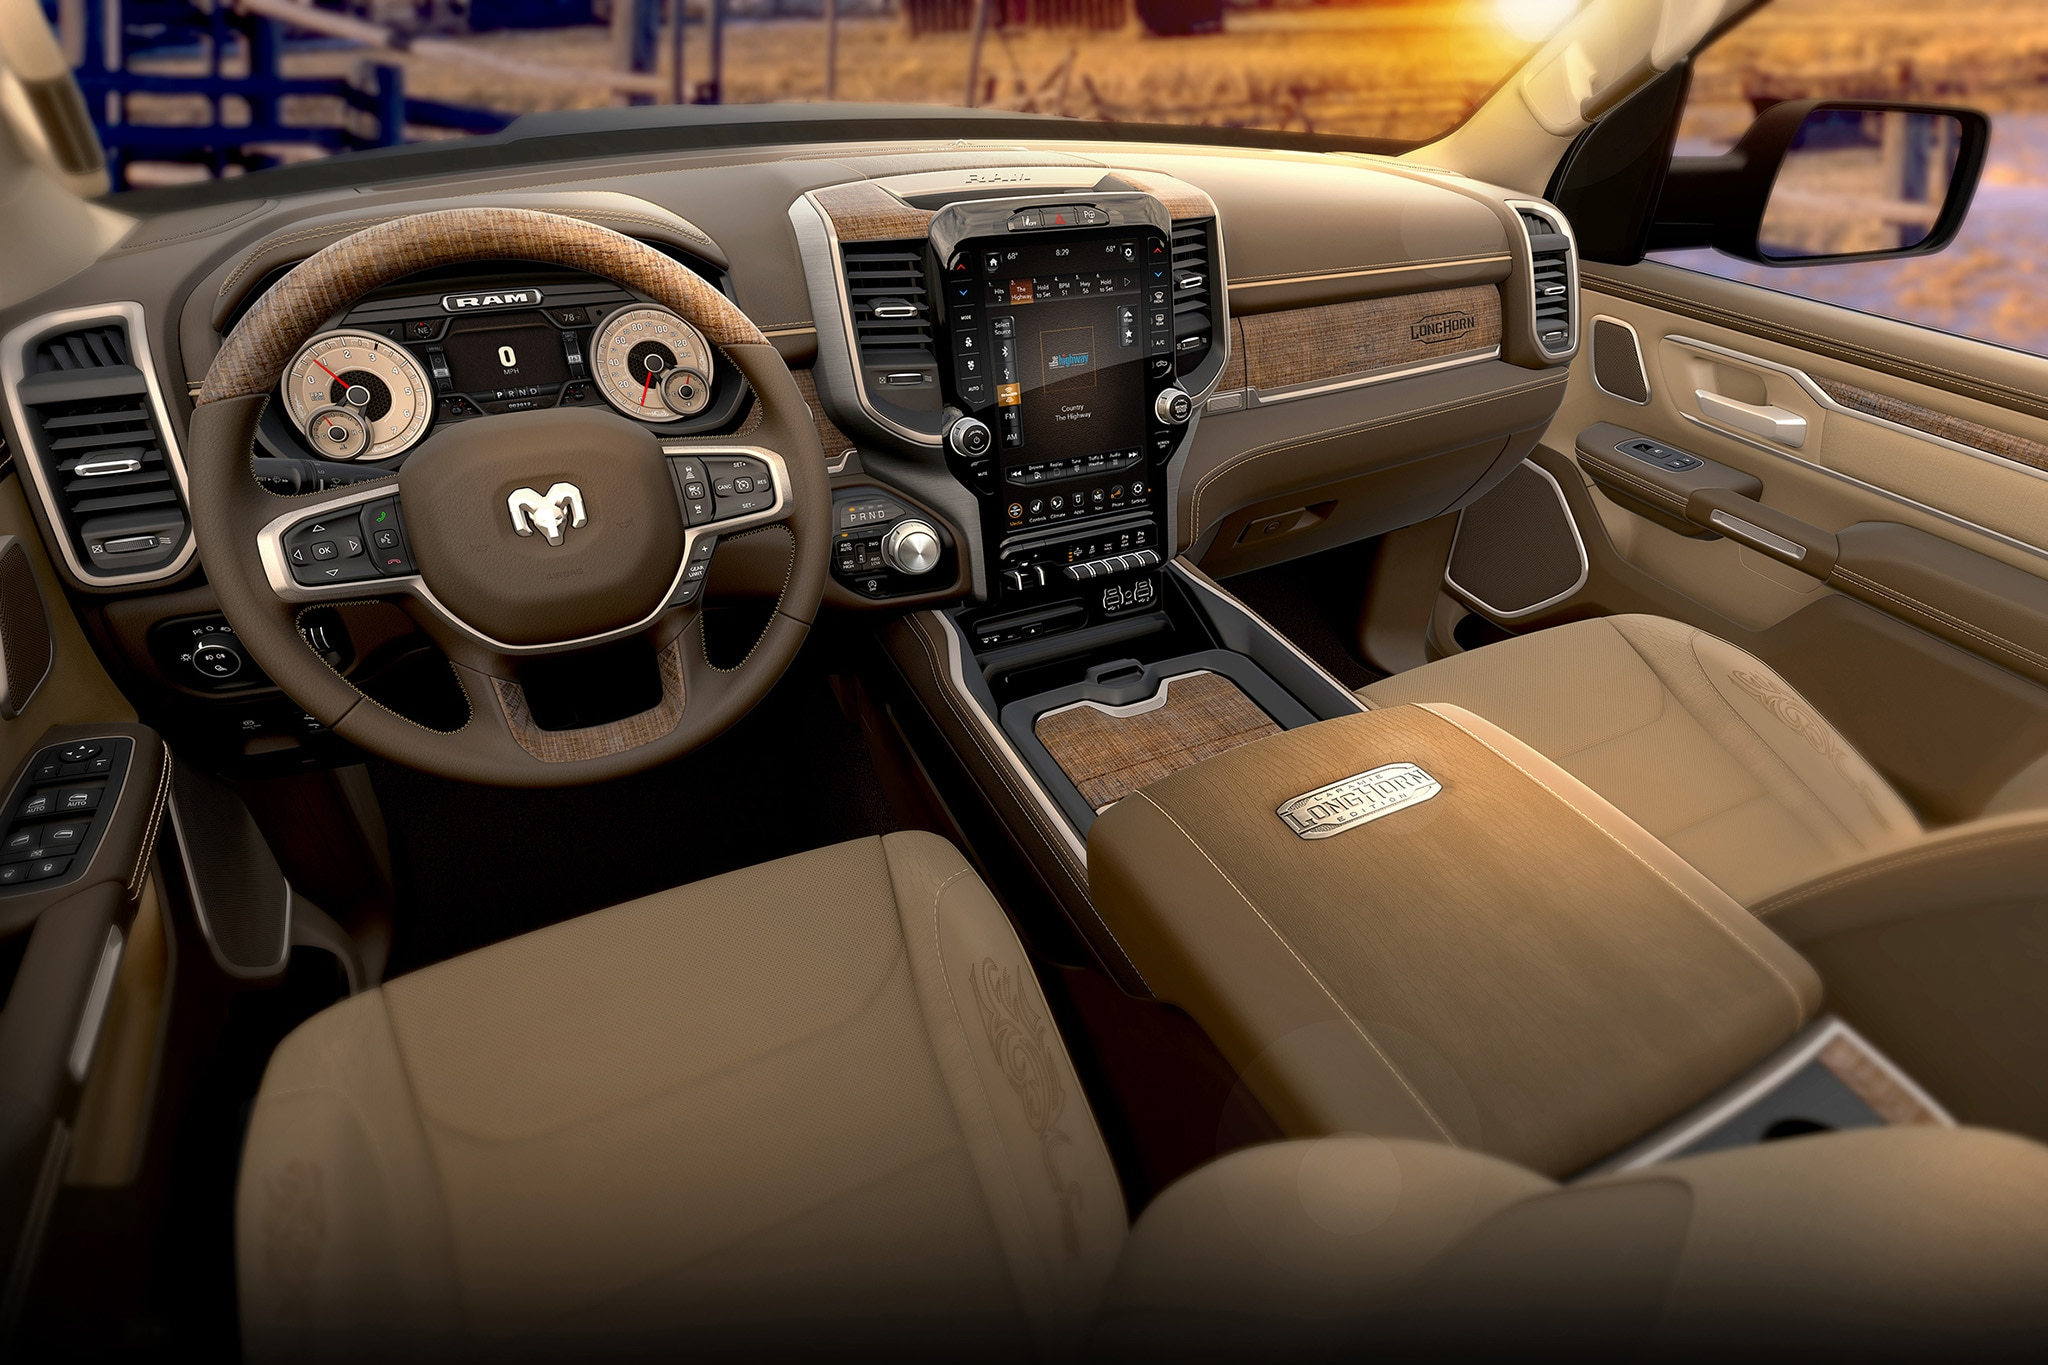 Dodge Longhorn 2018 >> 2019 Ram 1500 Laramie Longhorn Edition Reaches for the Sky | Automobile Magazine